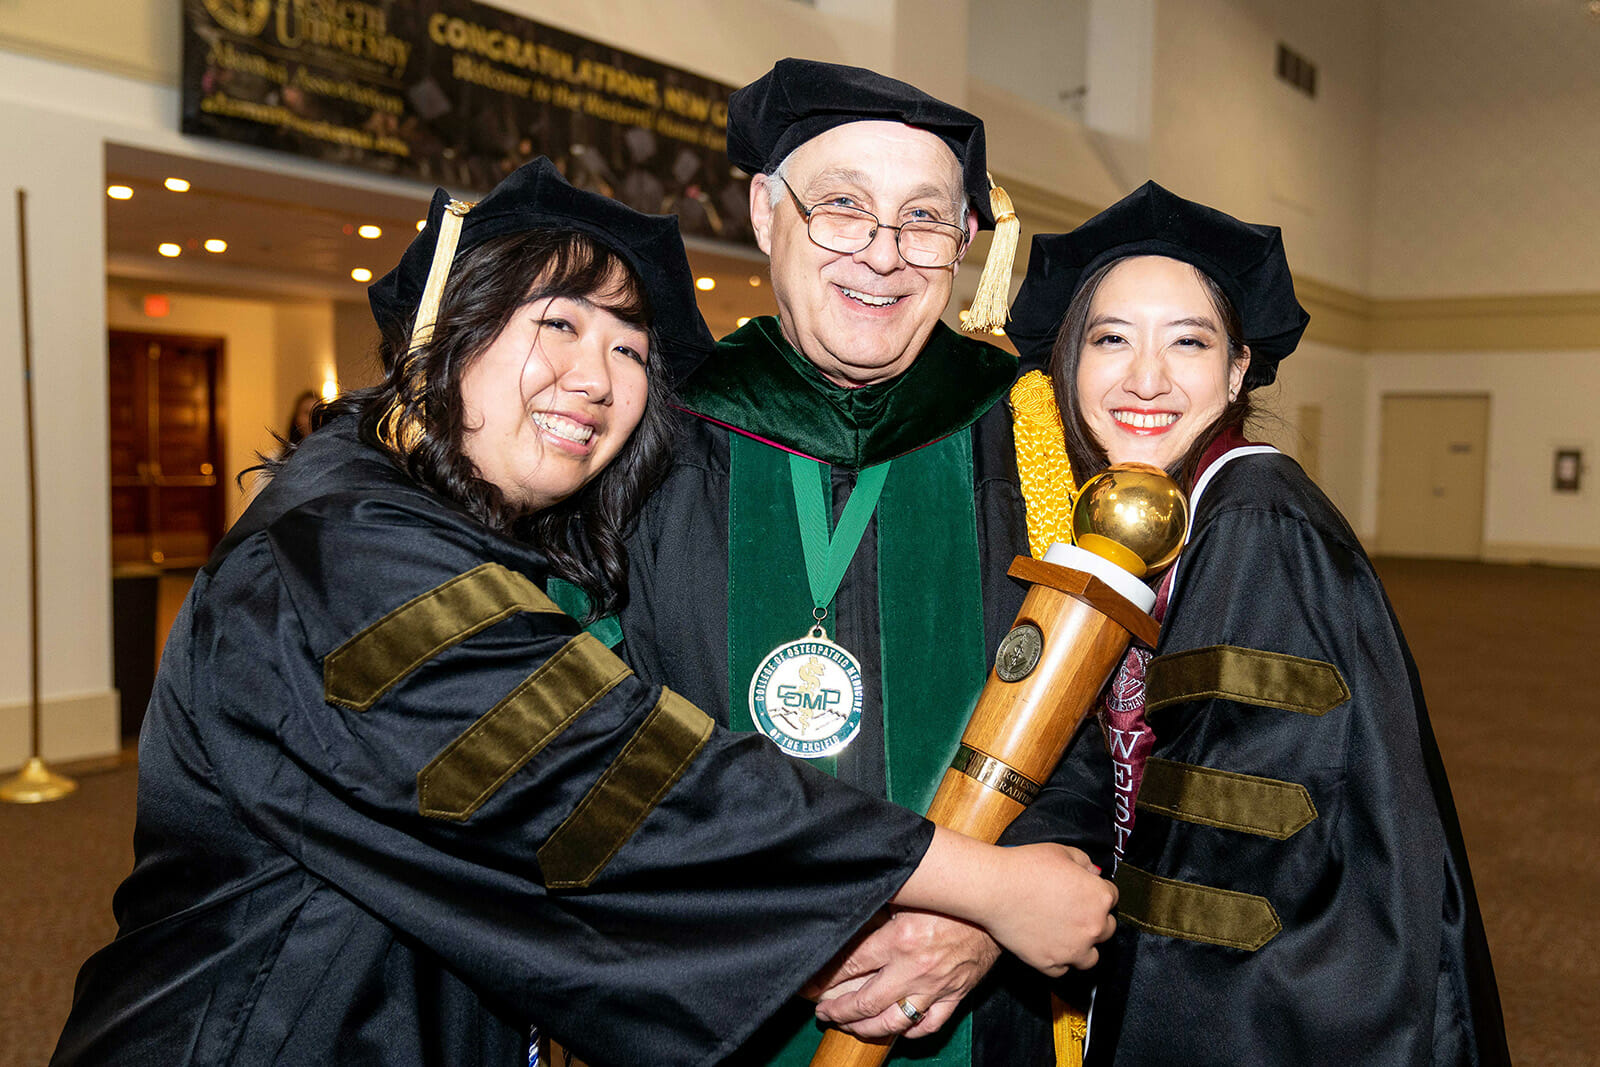 Two PharmD graduates posing with Dr. Cundari the University Marshal